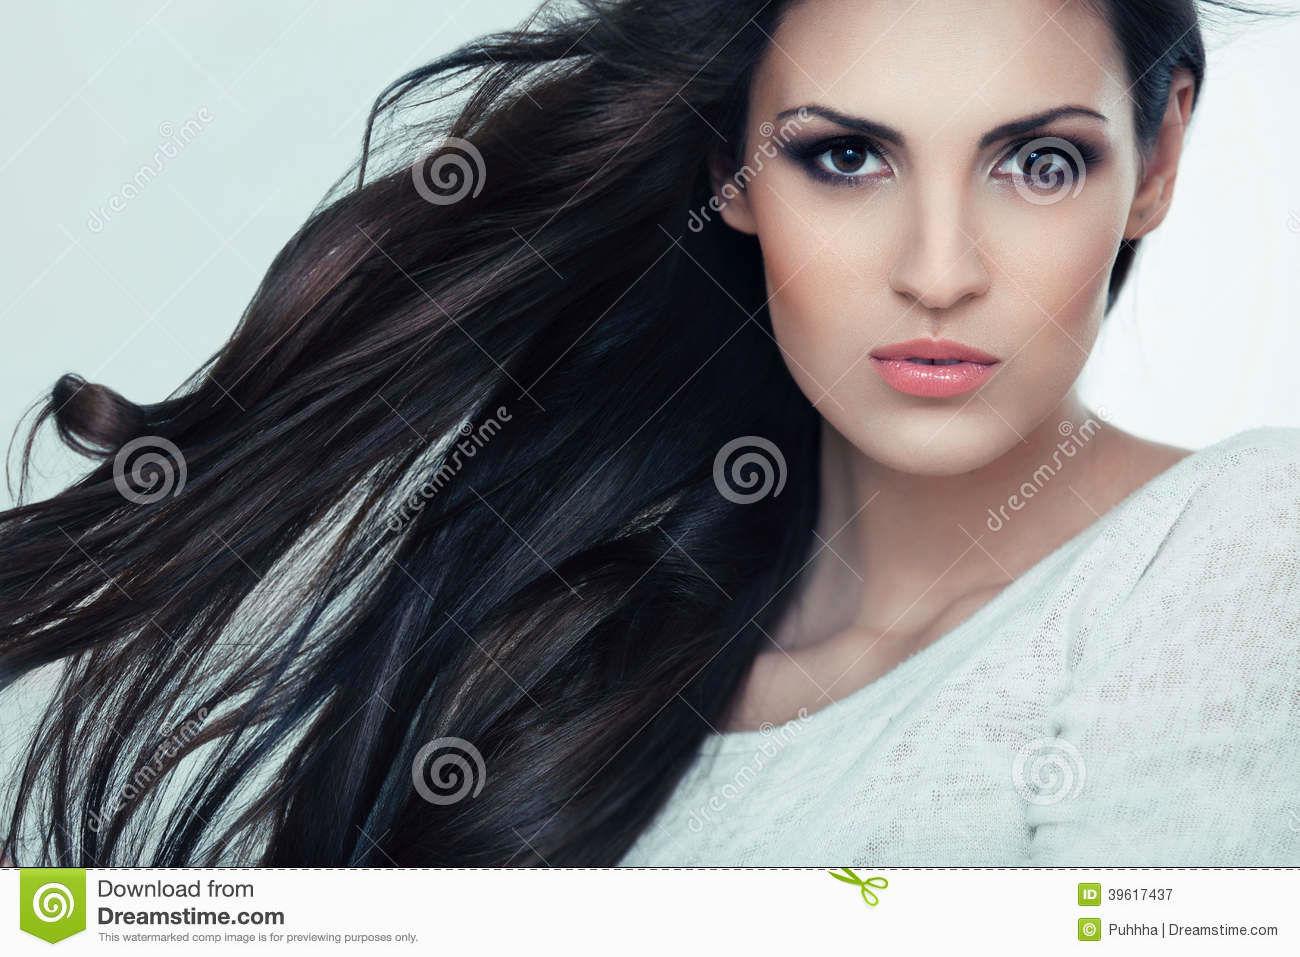 lovely cortes de cabelo em alta retrato-Legal Cortes De Cabelo Em Alta Layout